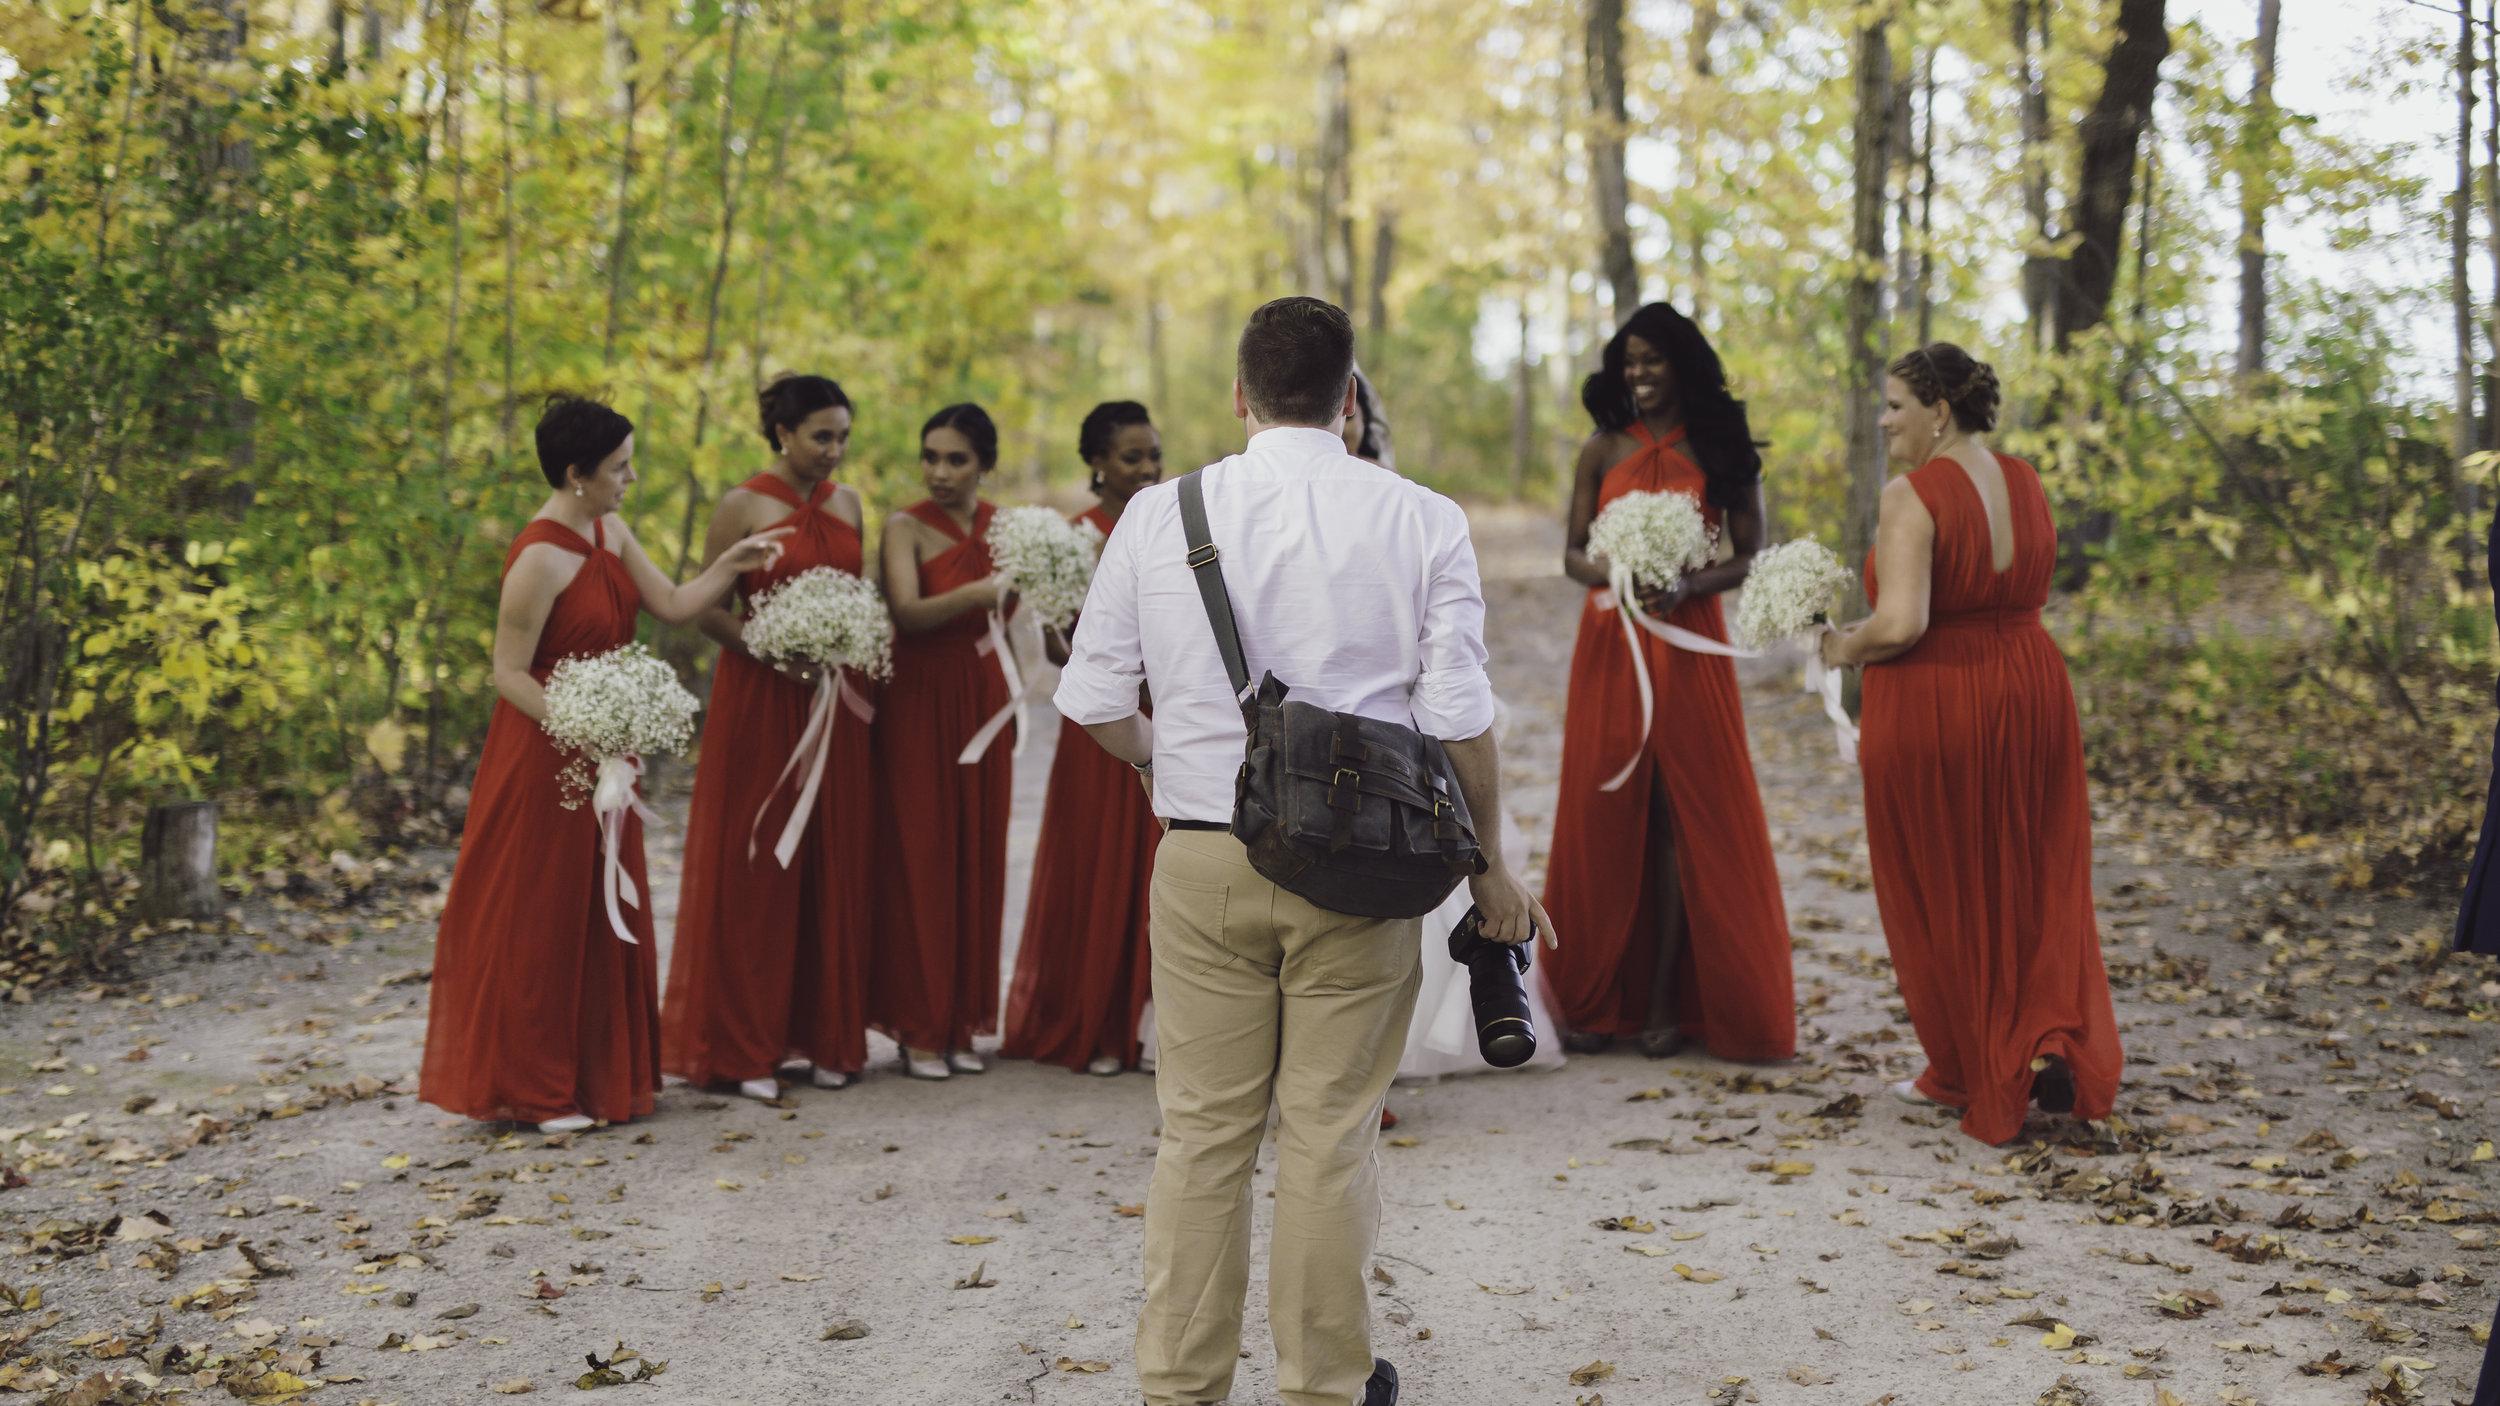 Will&Steph wedding -6.jpg